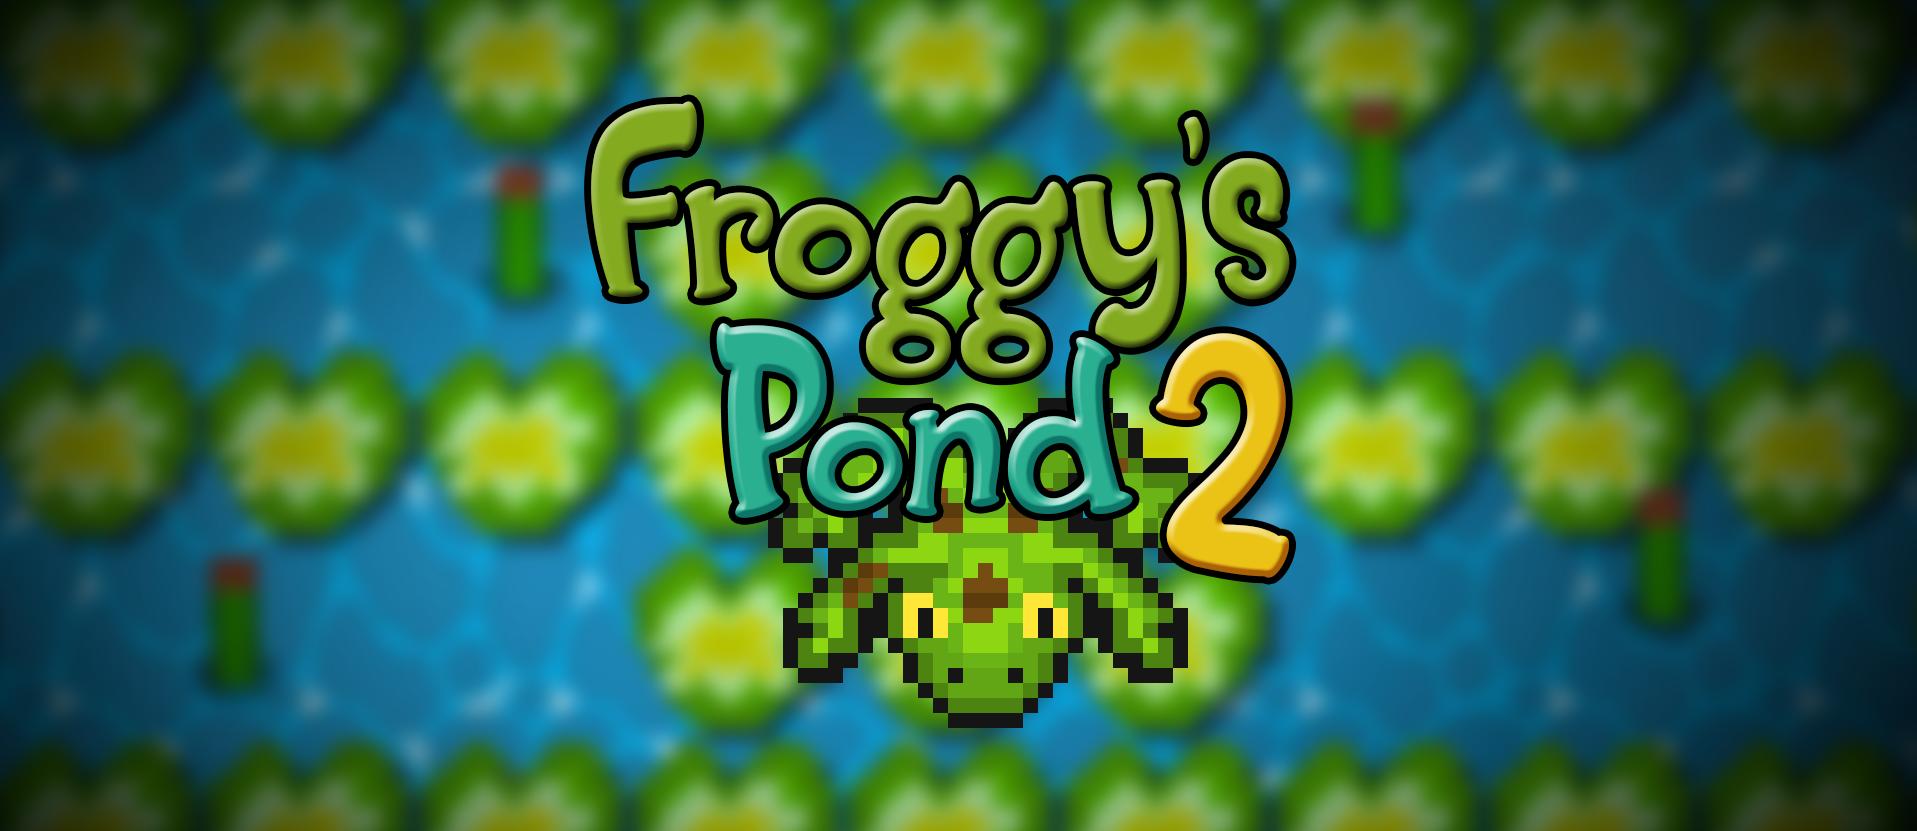 Froggy's Pond 2